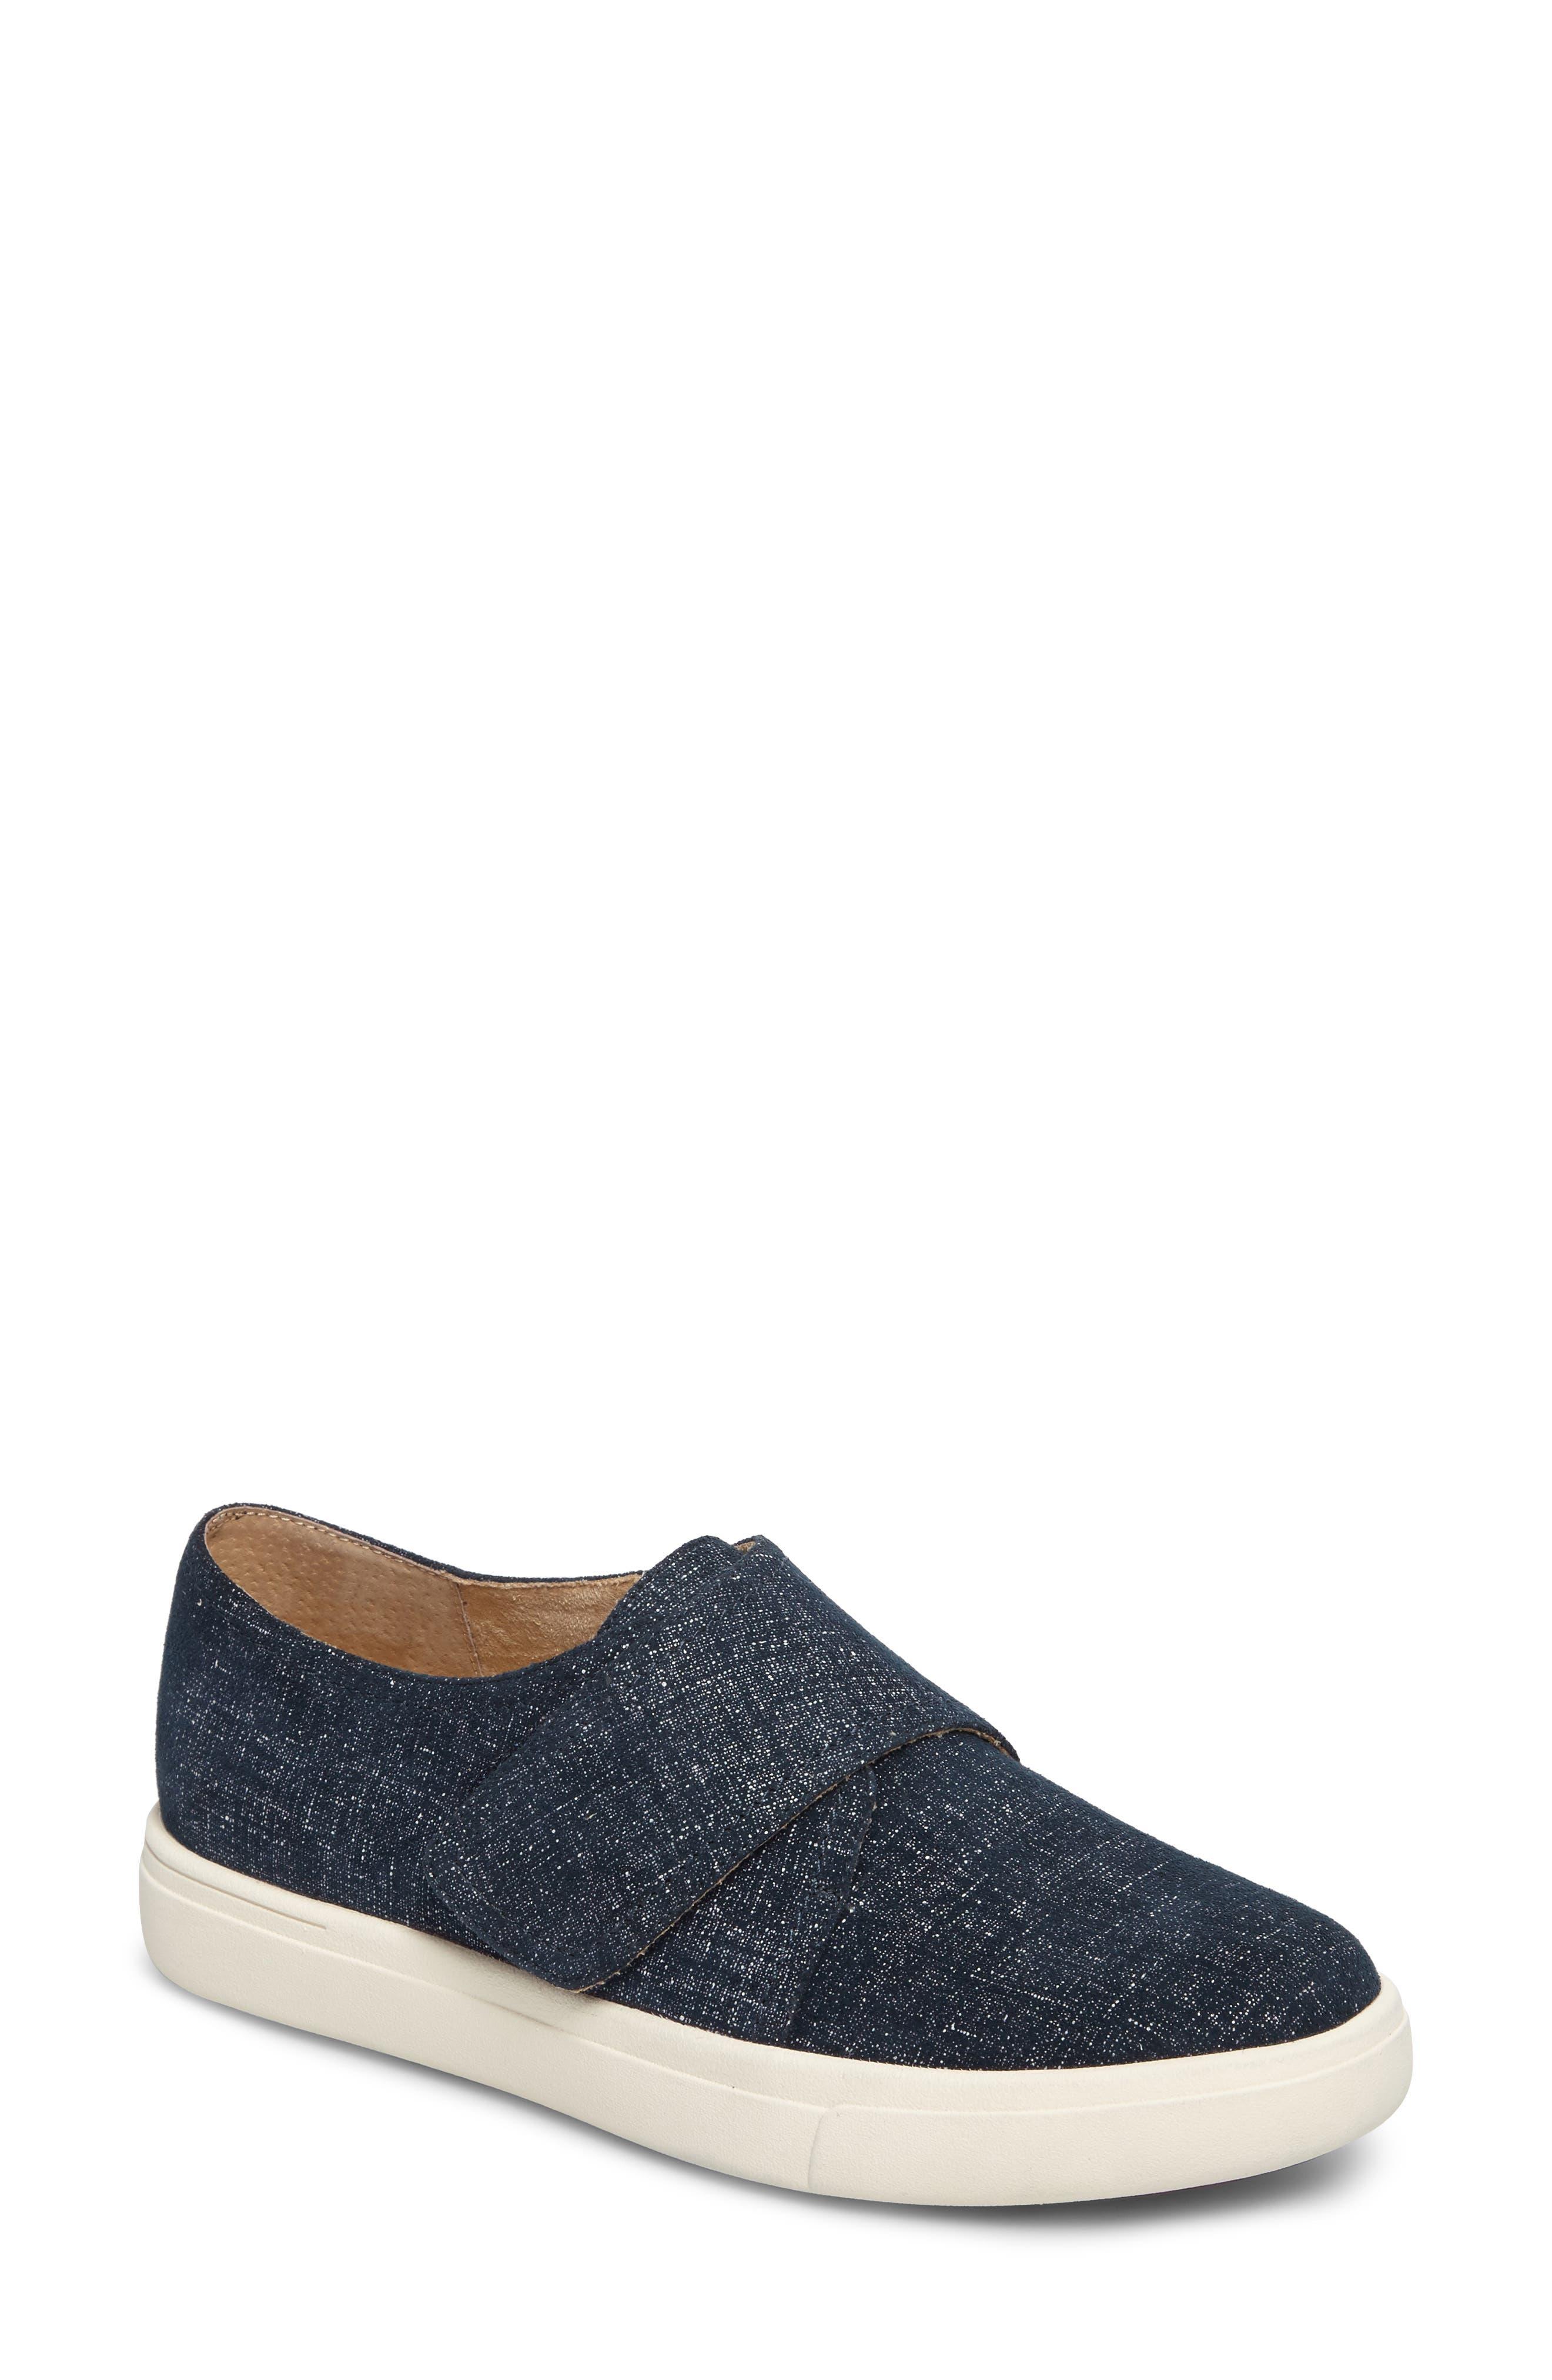 VANELI Oberon Slip-On Sneaker, Main, color, JEANS PRINTED SUEDE